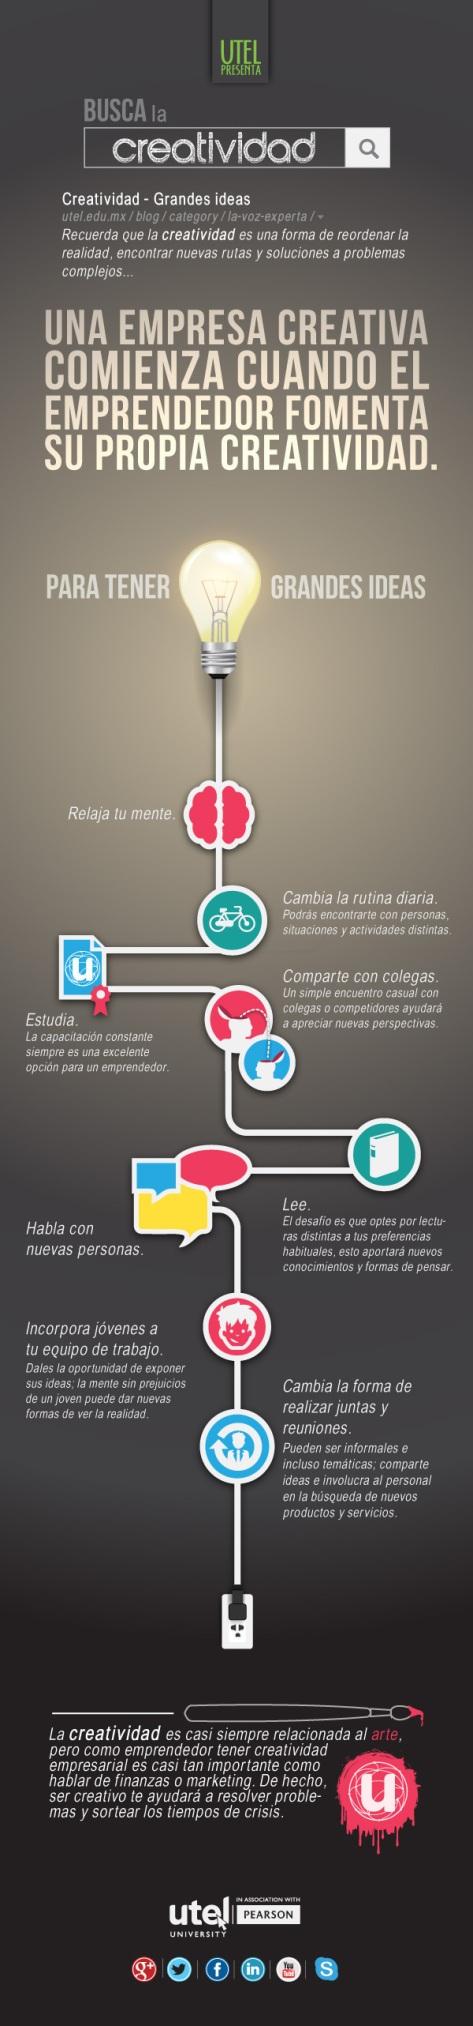 creatividad-infografia